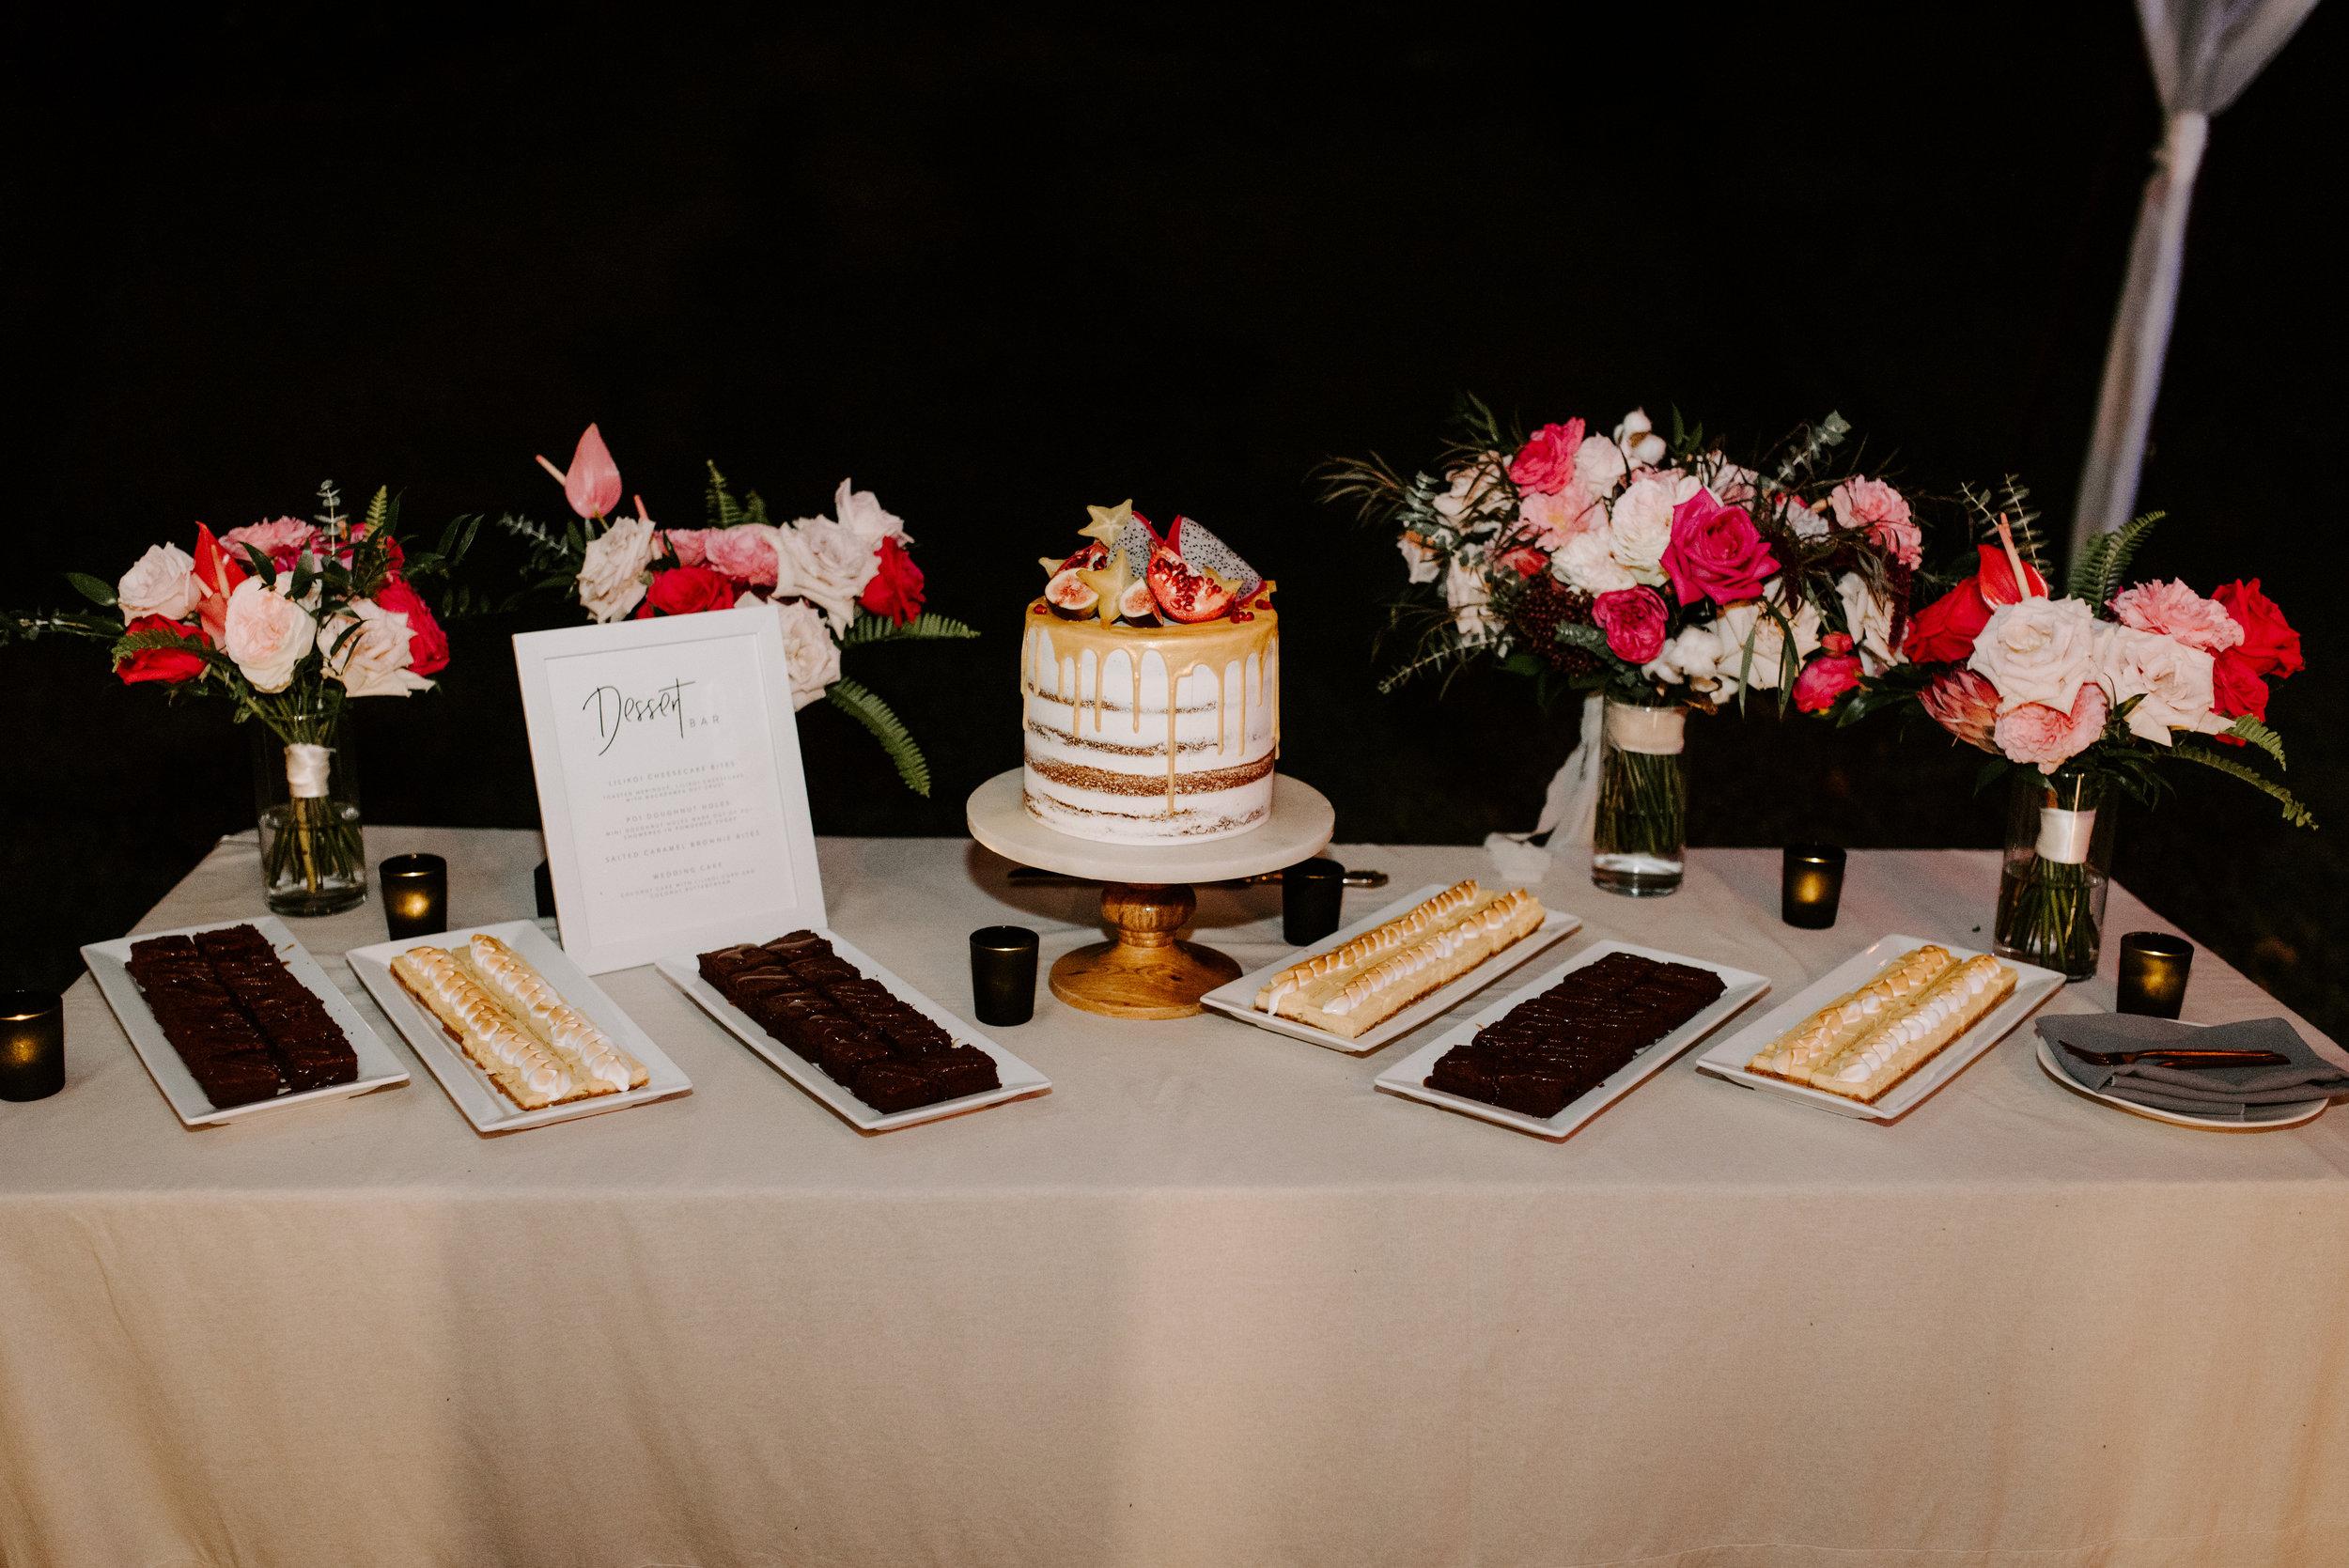 Another Dessert Table.jpg